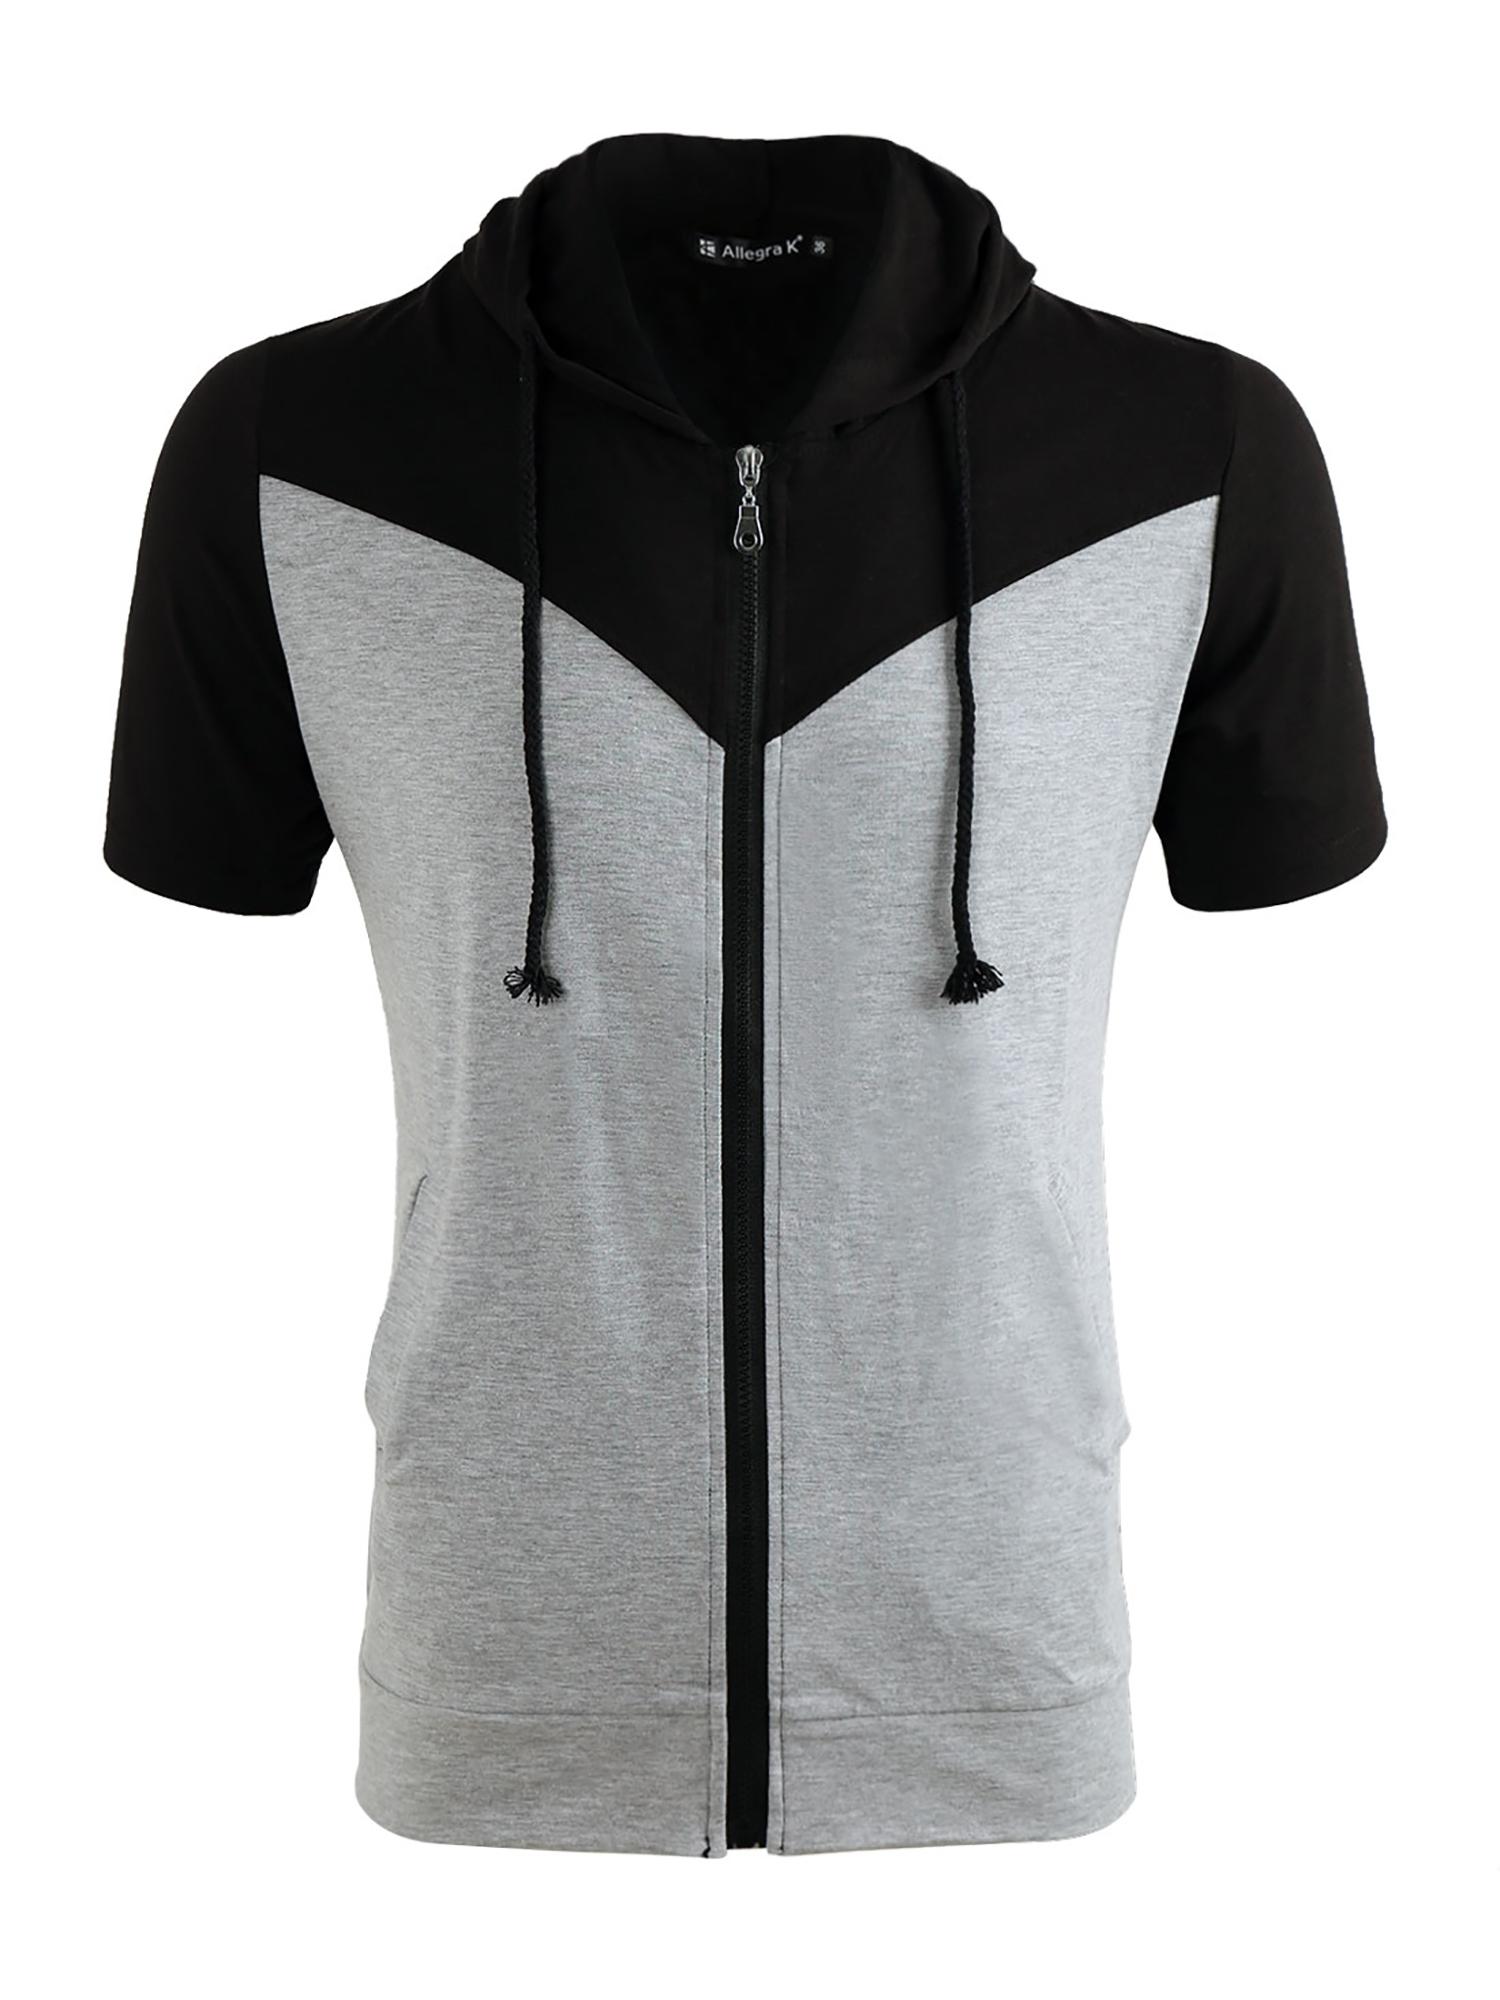 Azzuro Men's Contrast Color Zip Hoodie Black Gray (Size M / 40)